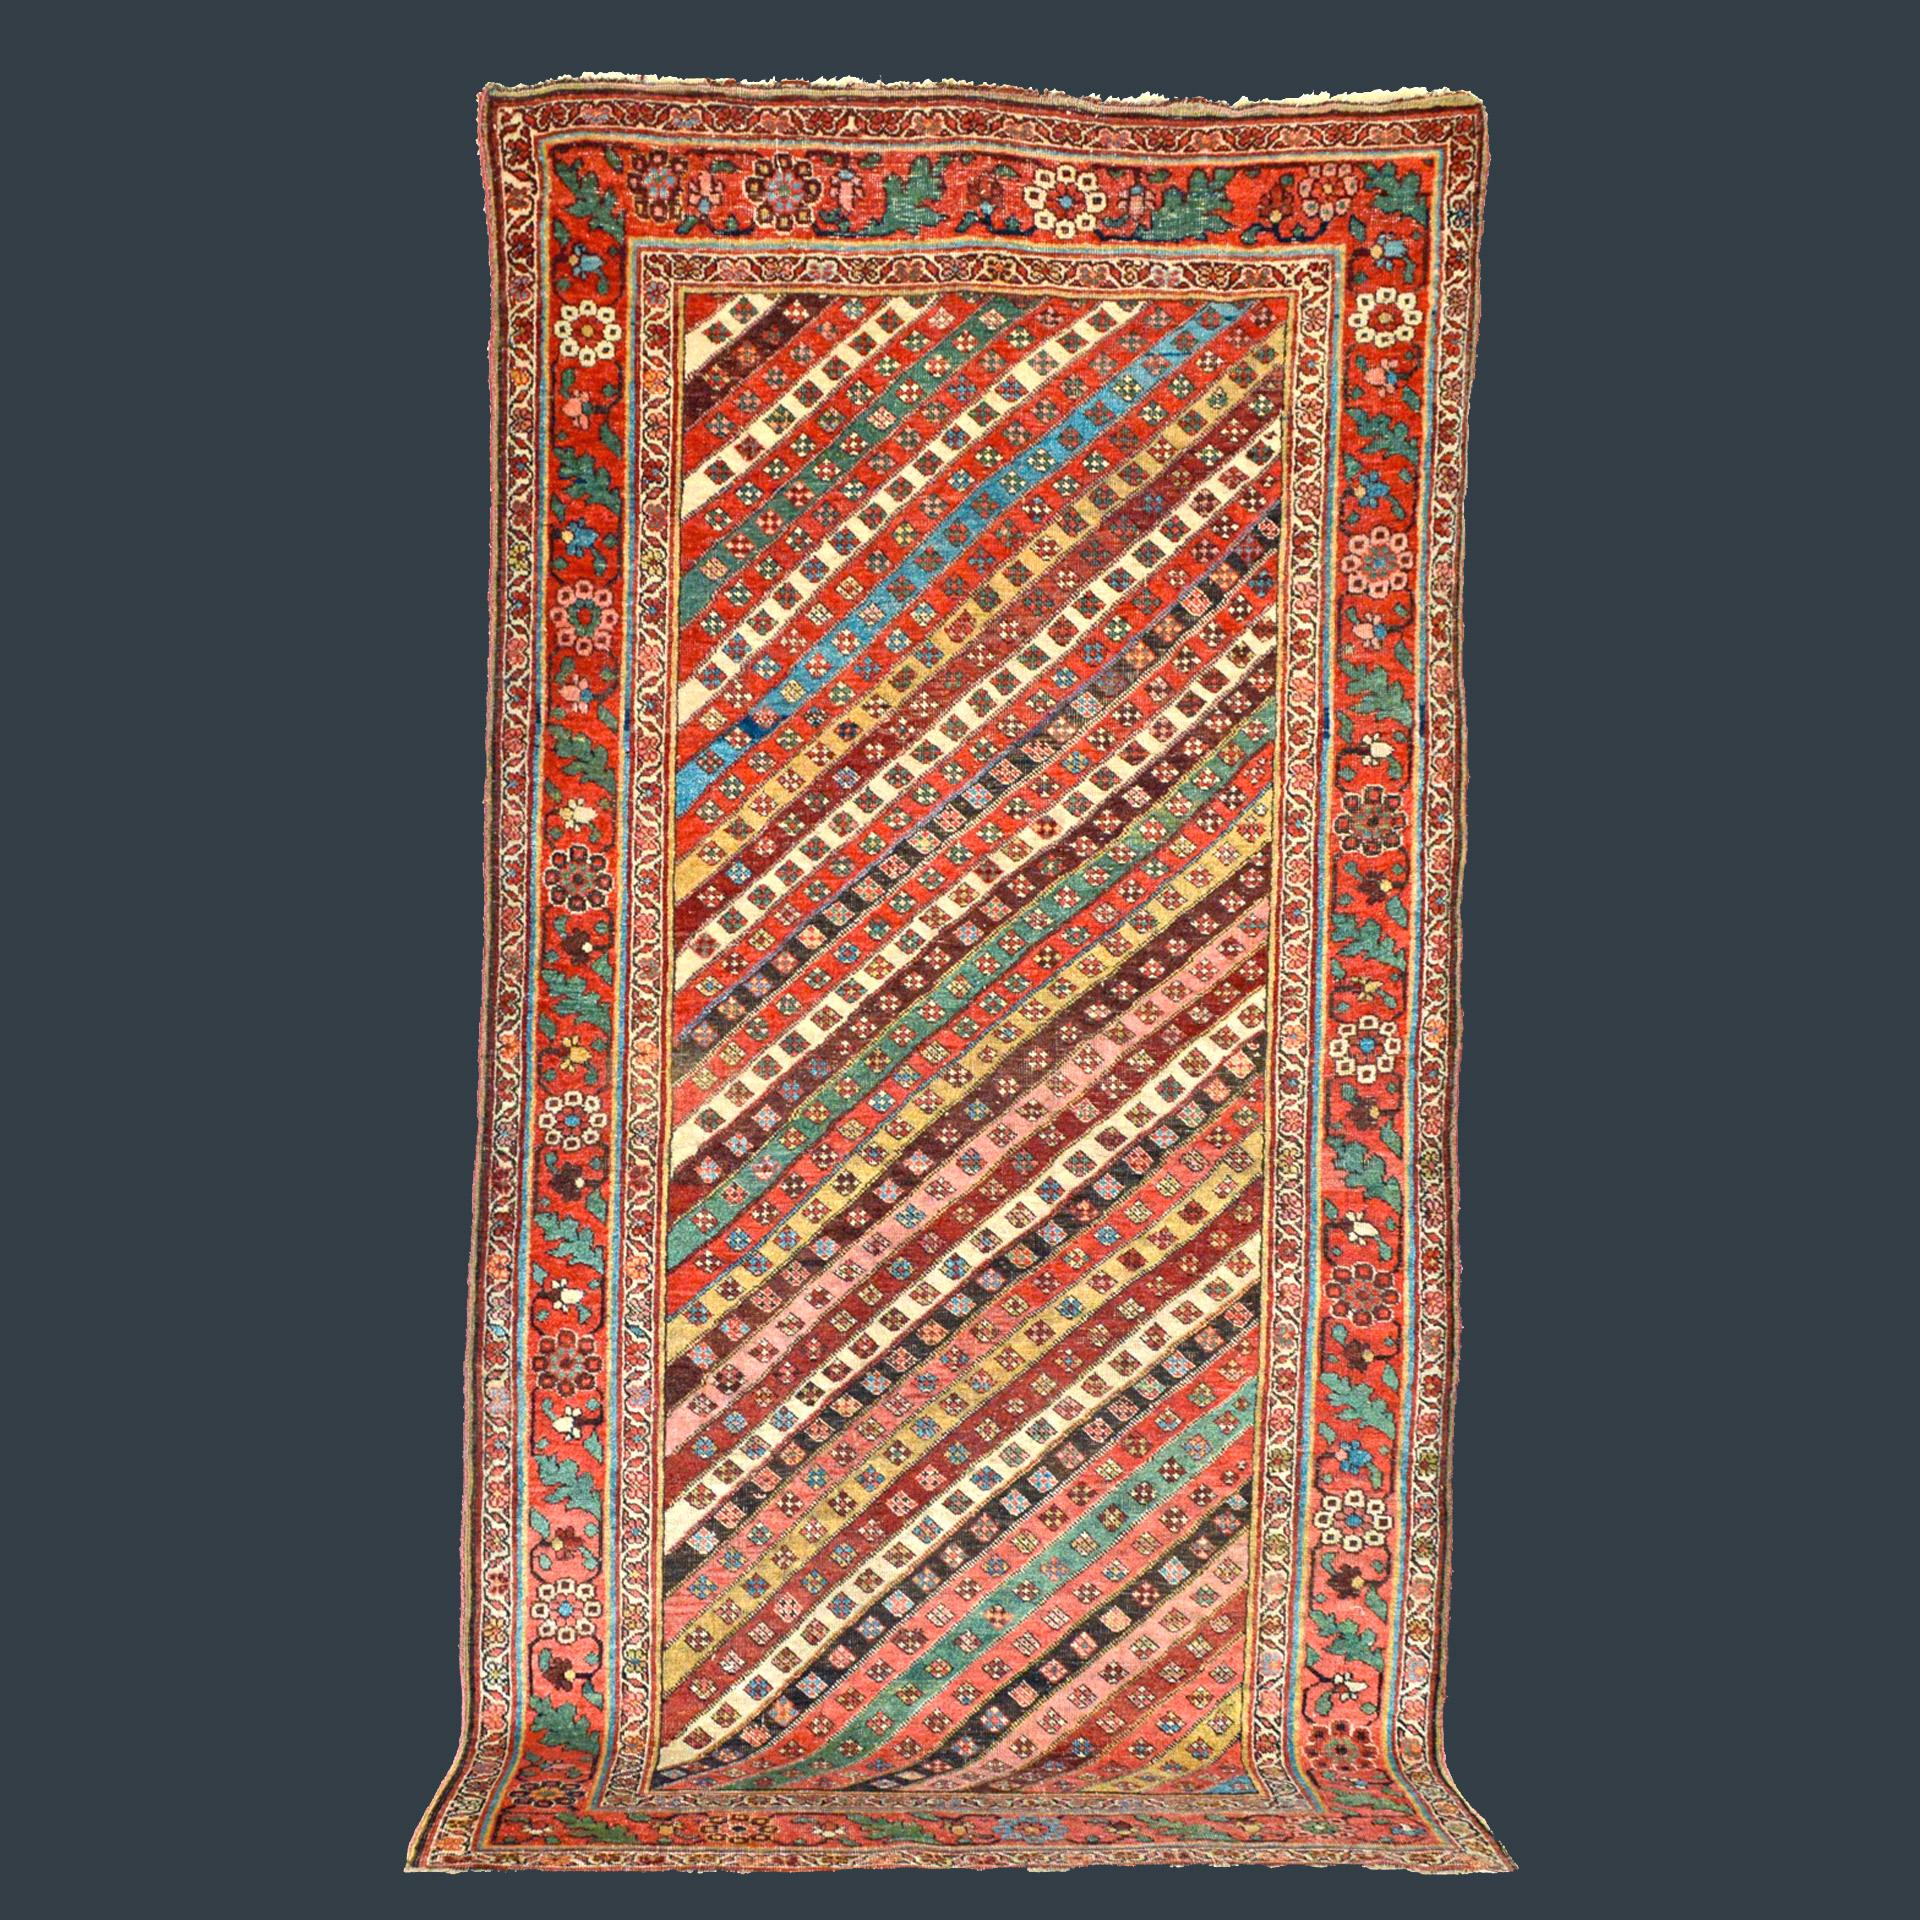 Antique Bidjar rug with diagonal stripe field design